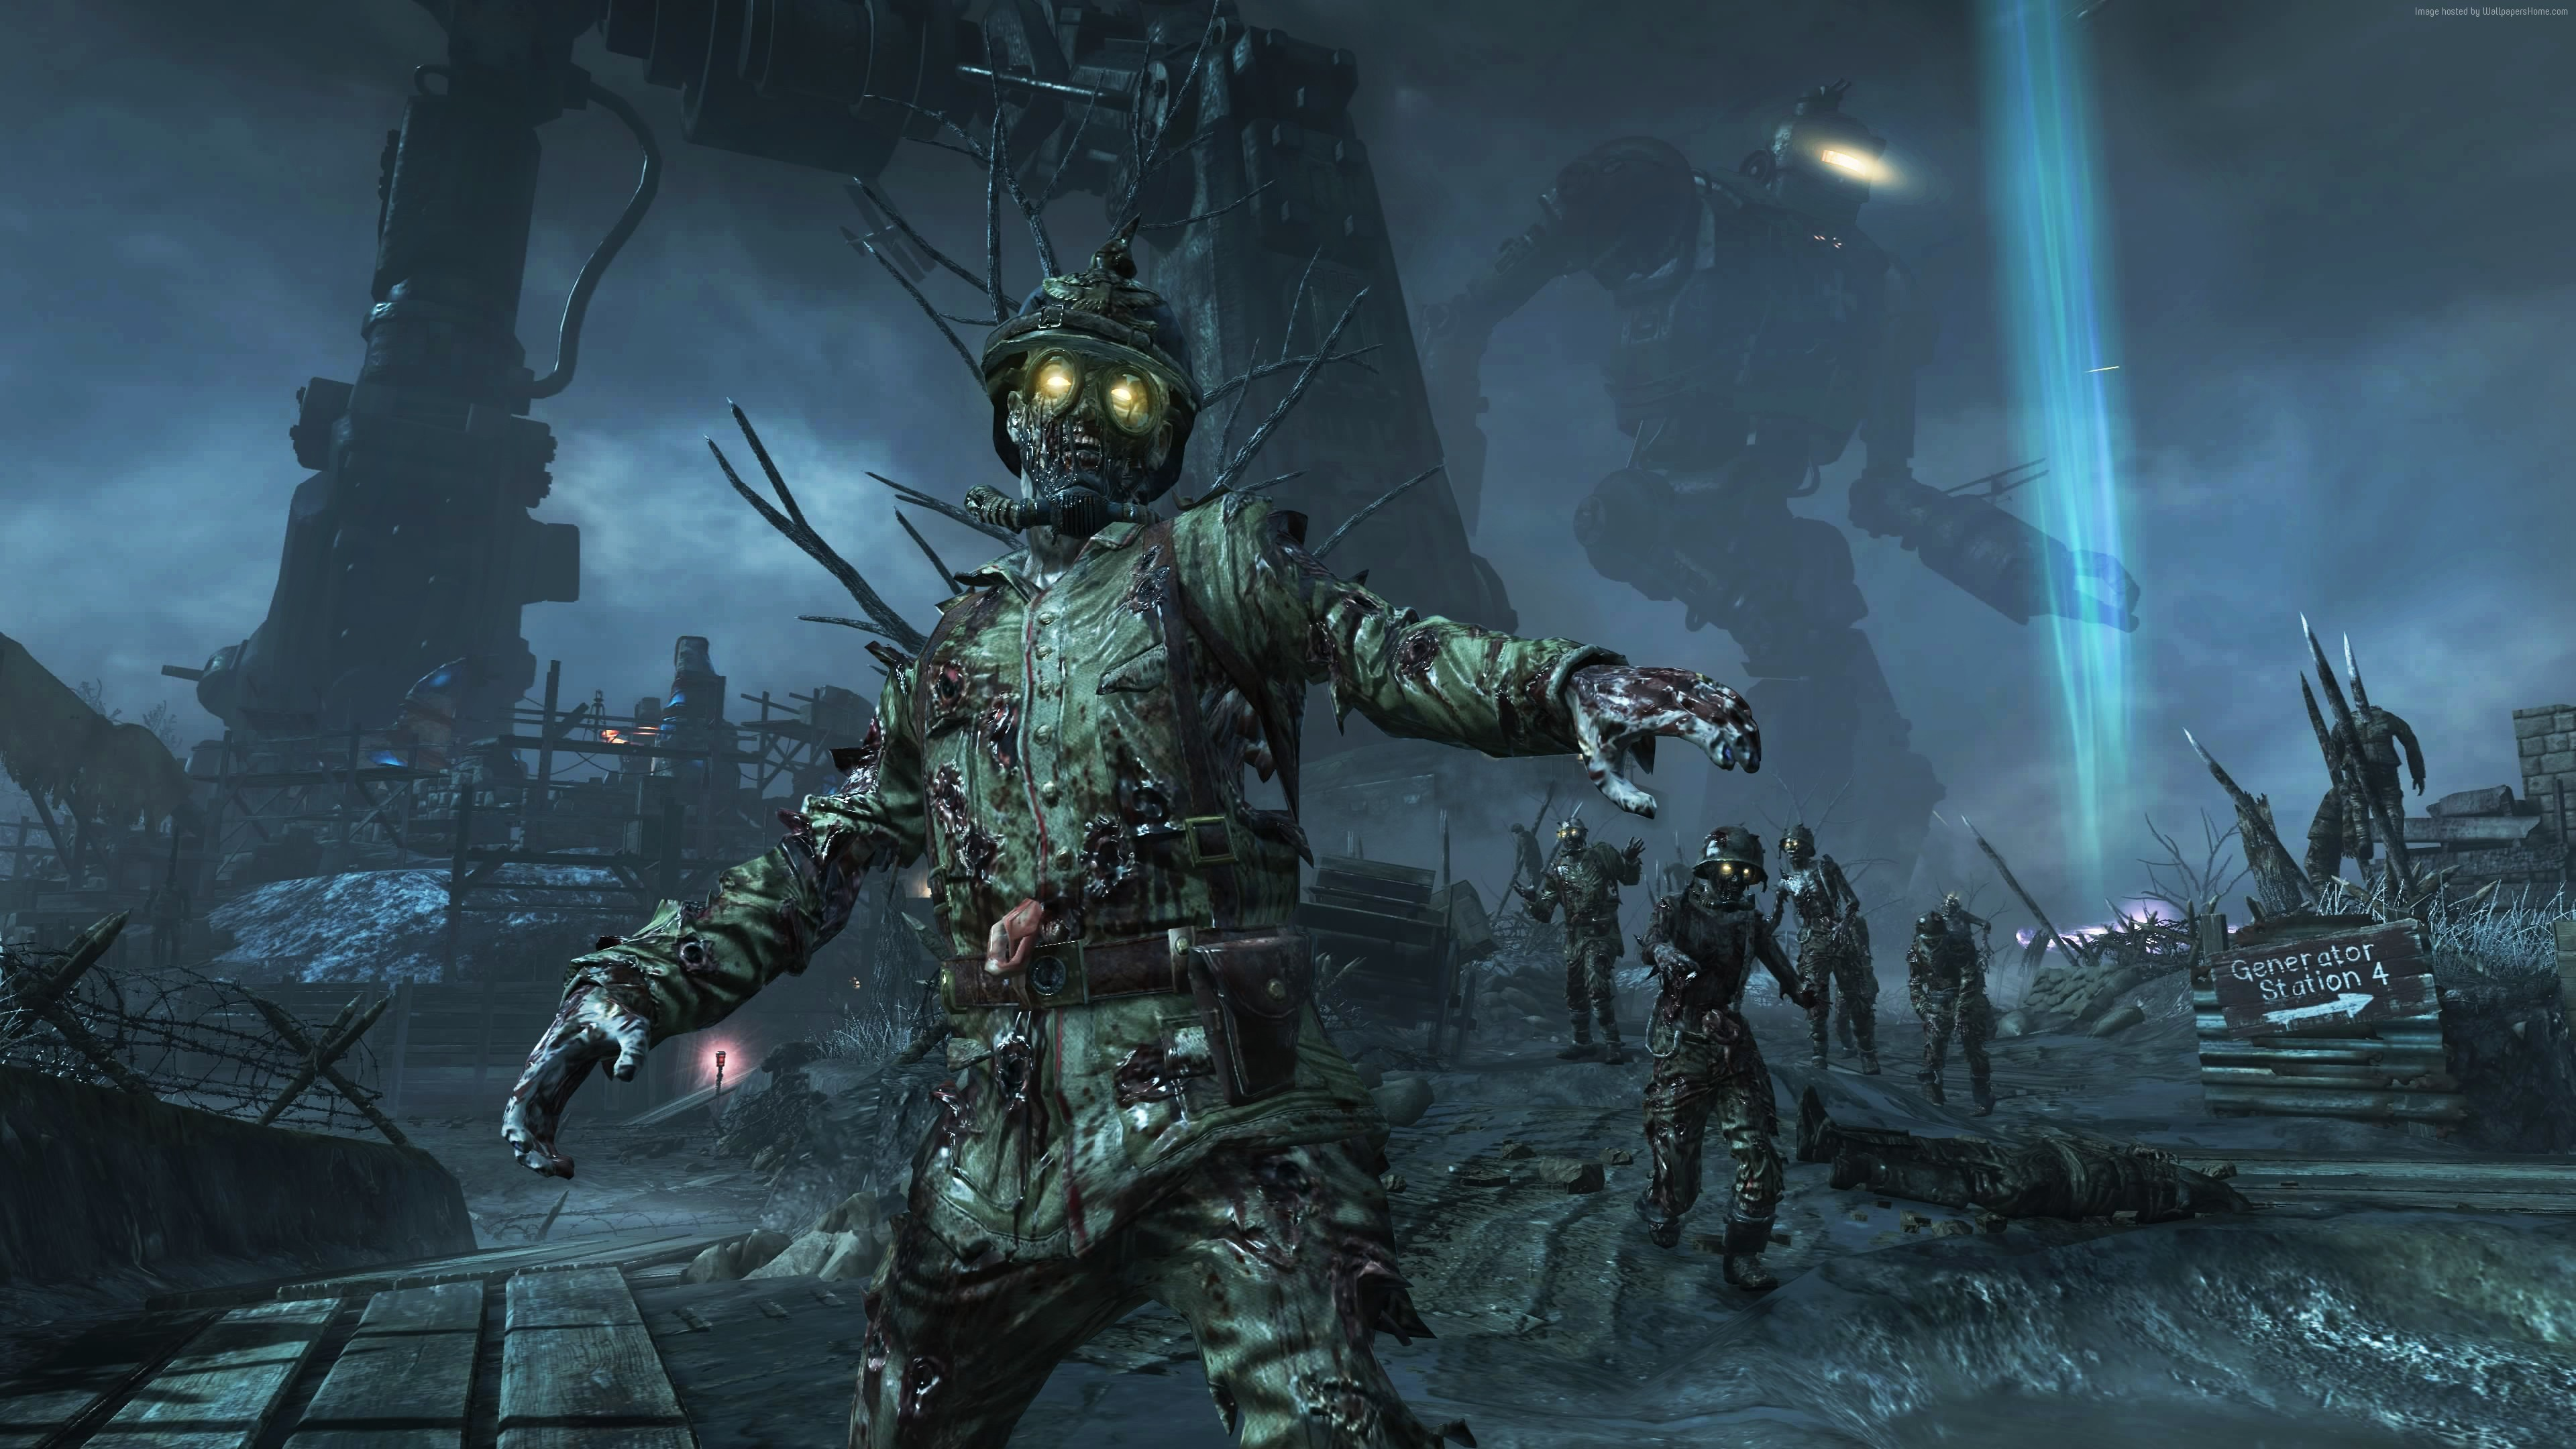 black ops zombies wallpaper tag download hd wallpaperhd call of